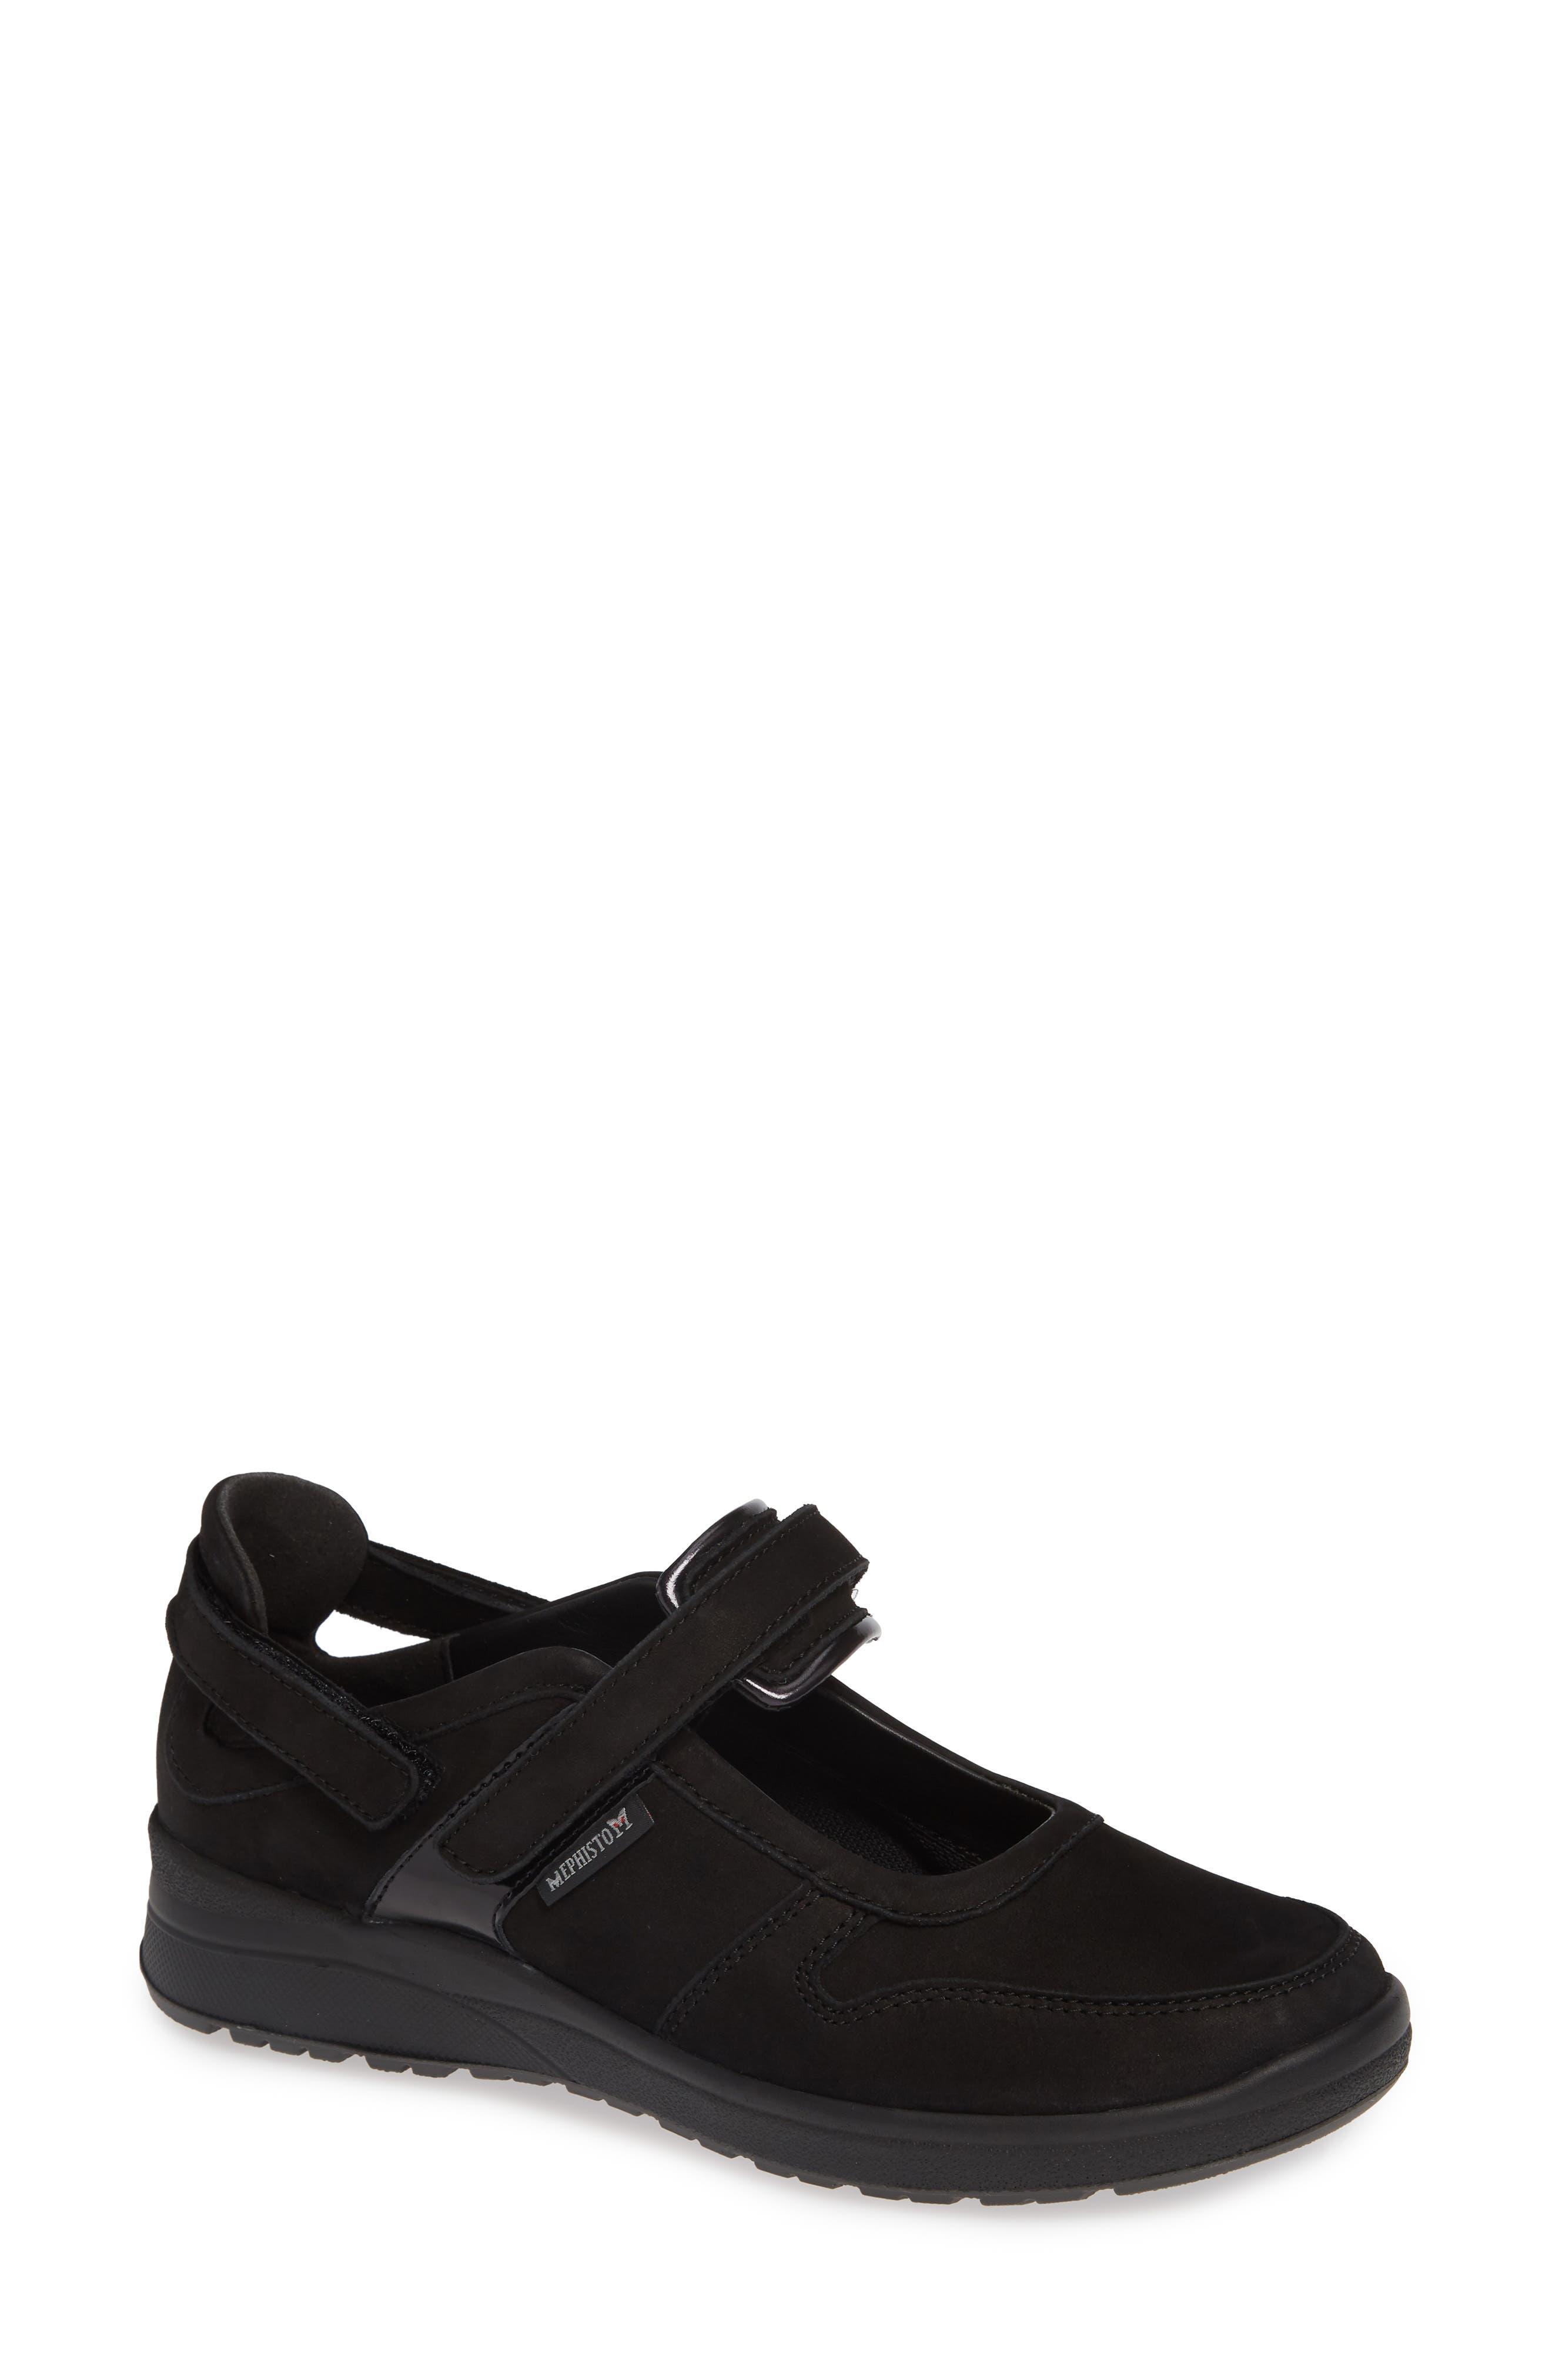 MEPHISTO, Rejine Sneaker, Main thumbnail 1, color, BLACK FABRIC